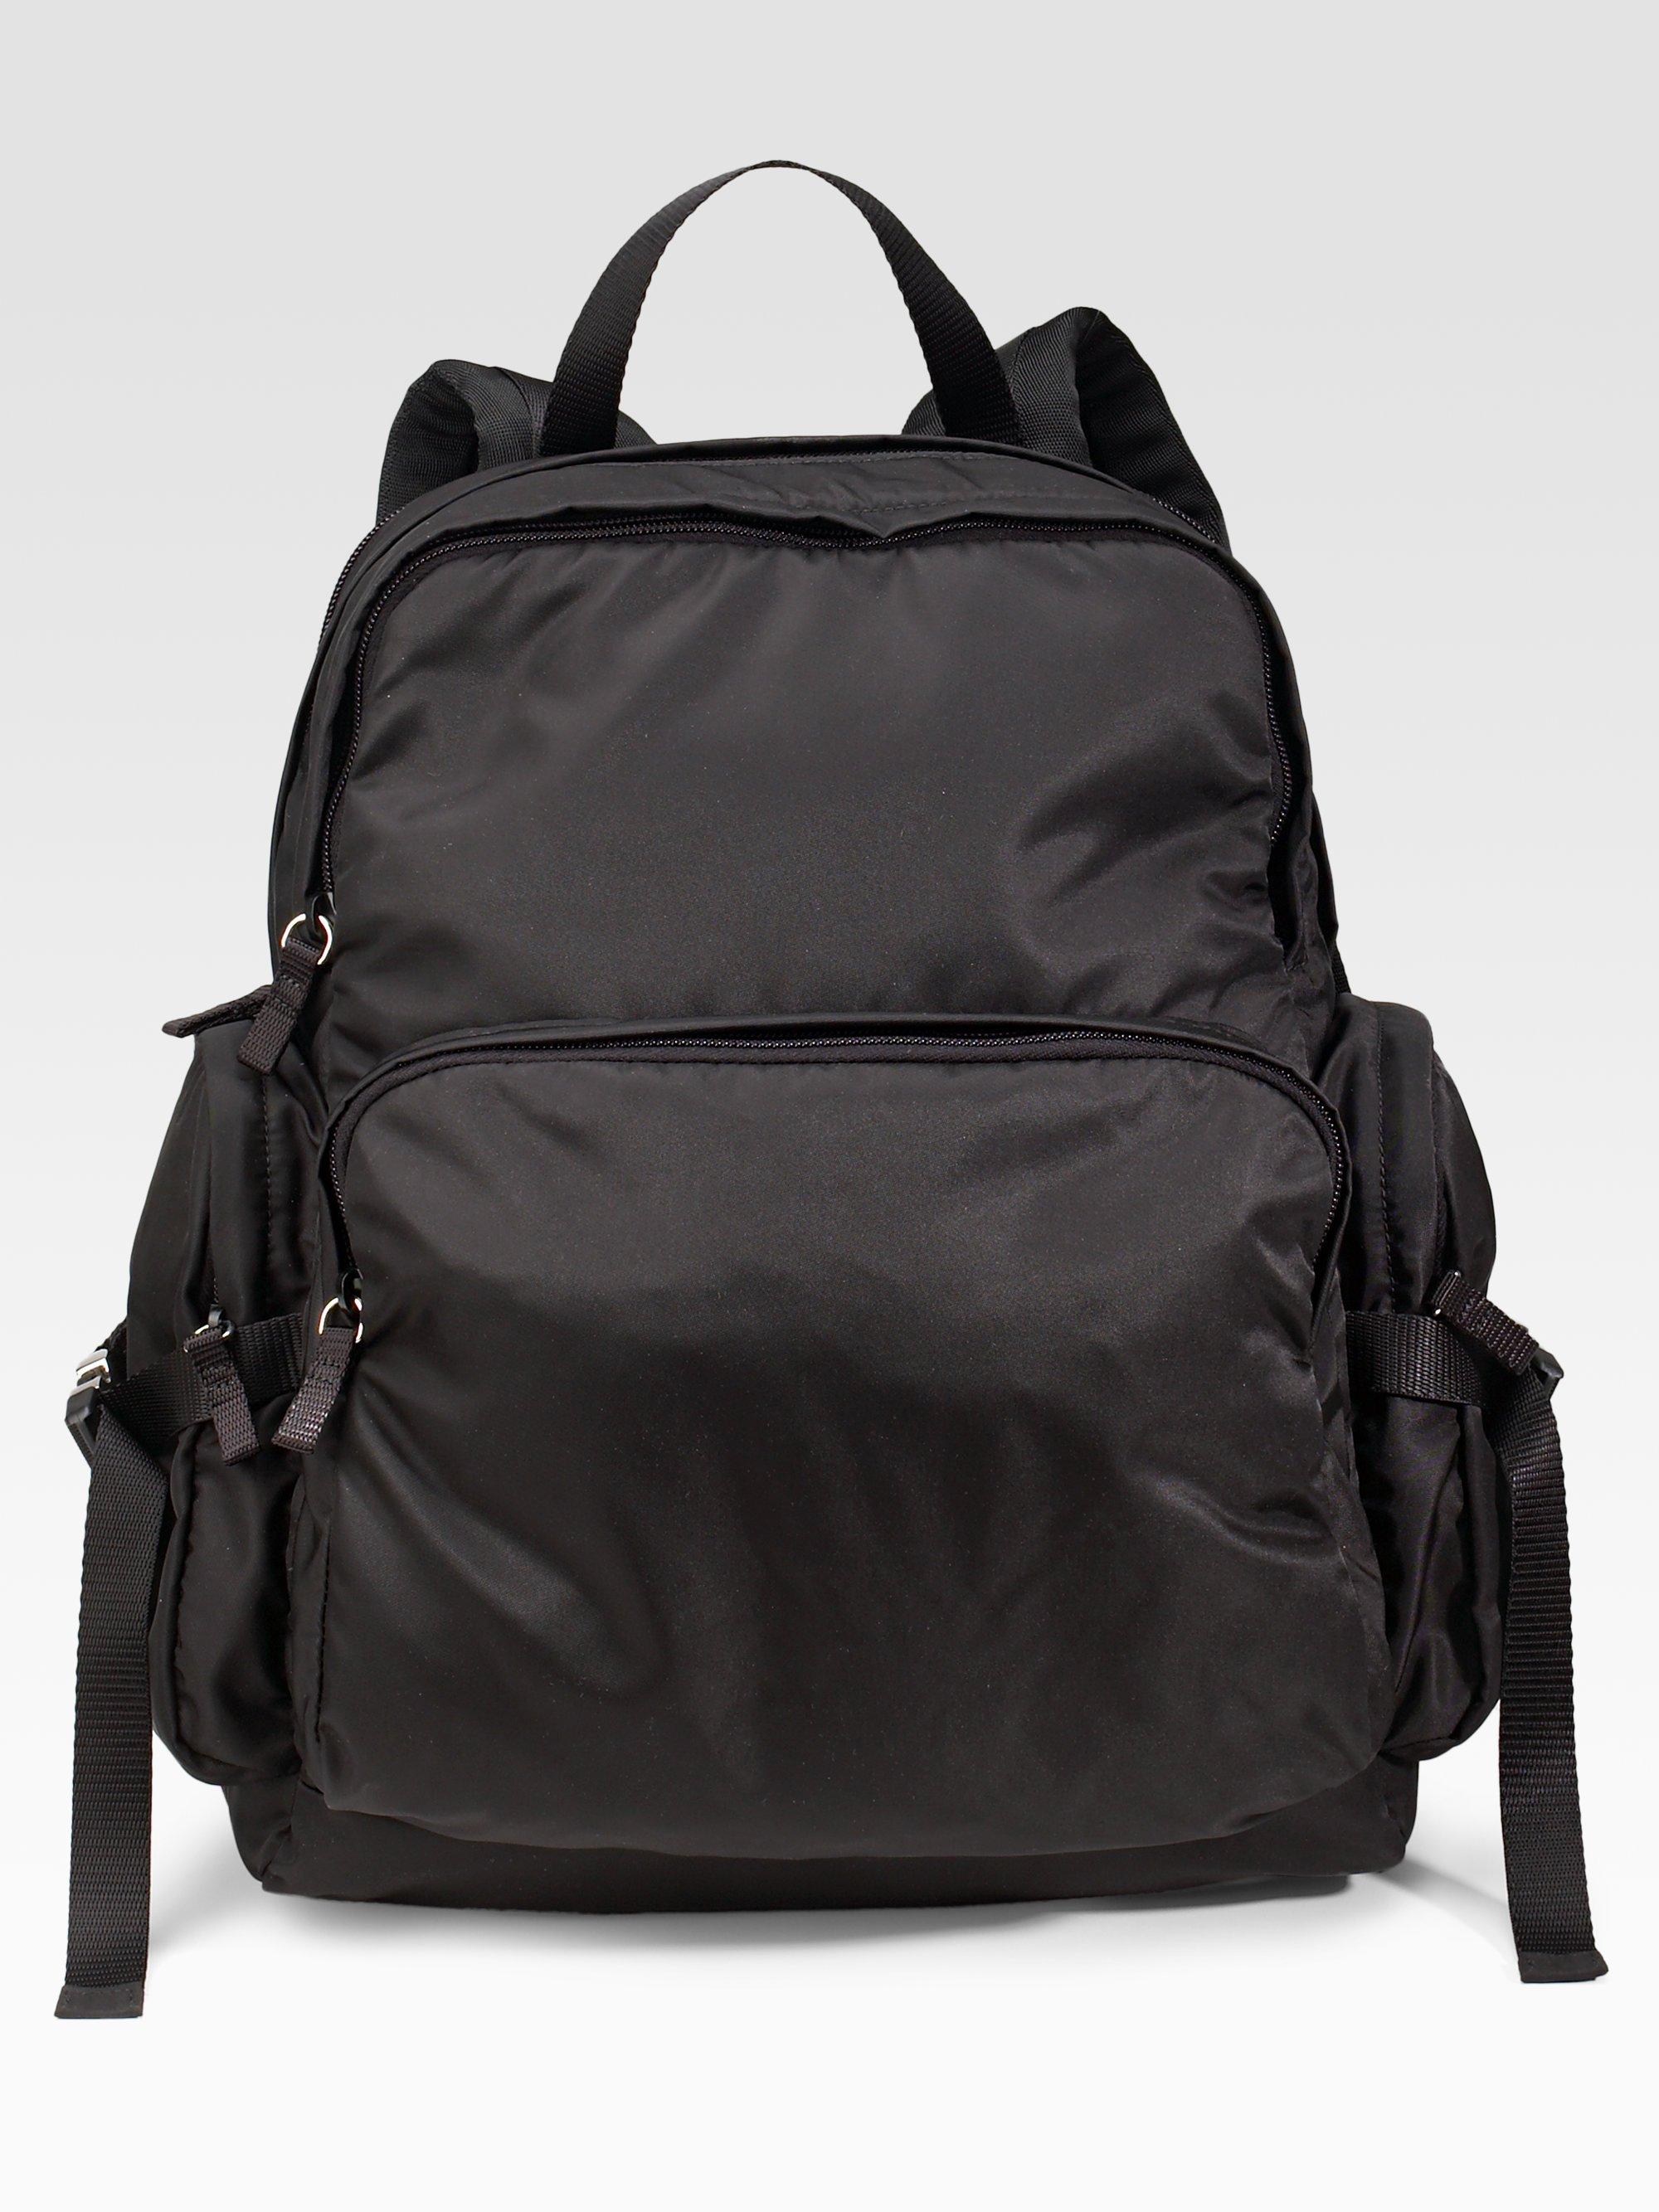 ... reduced lyst prada woven nylon backpack in black for men 82562 c87ca 4cd507695ad18